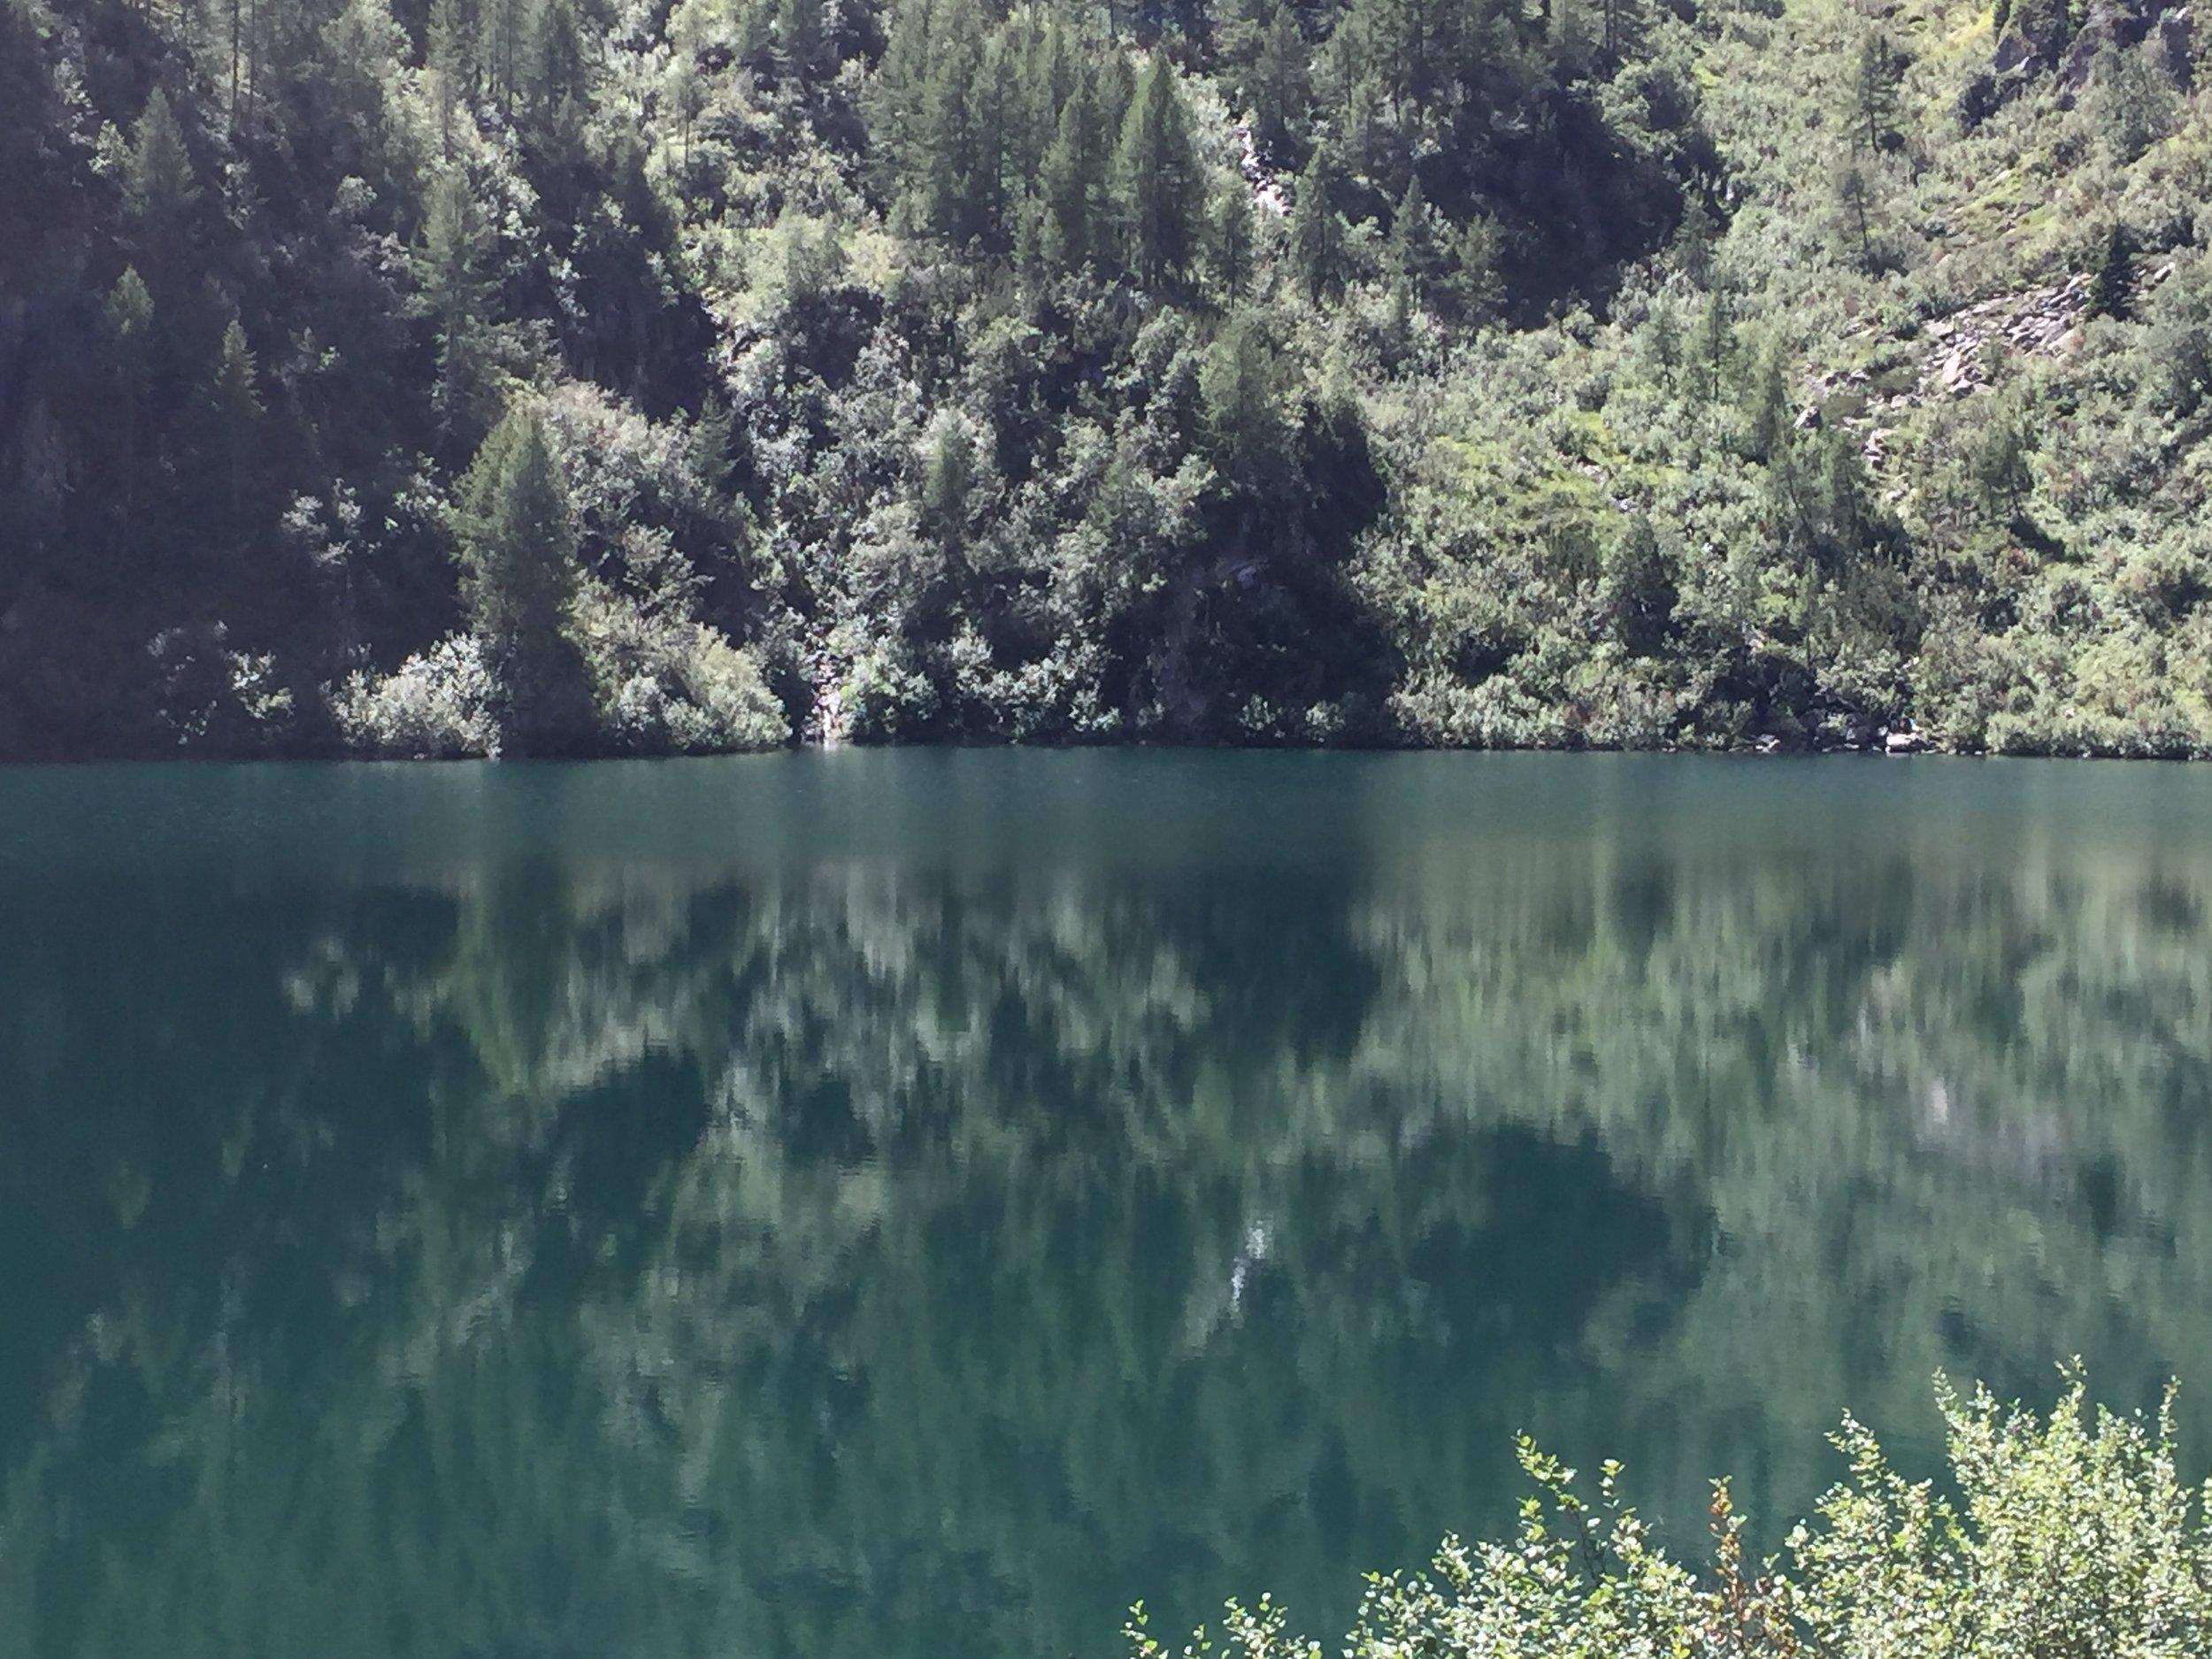 Reflections in Lago di Barco